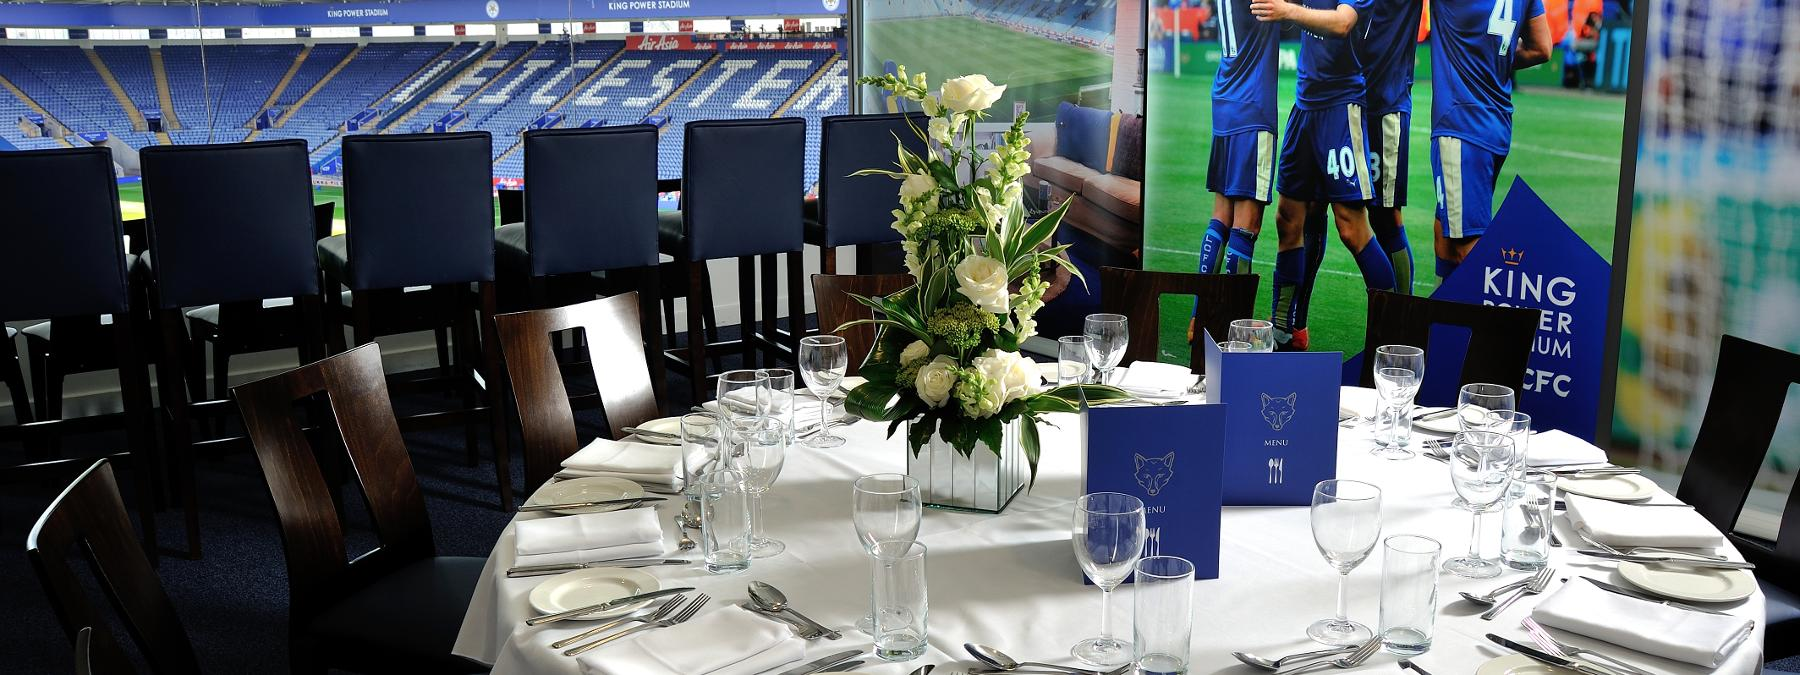 TV Studio | Hospitality I Leicester City